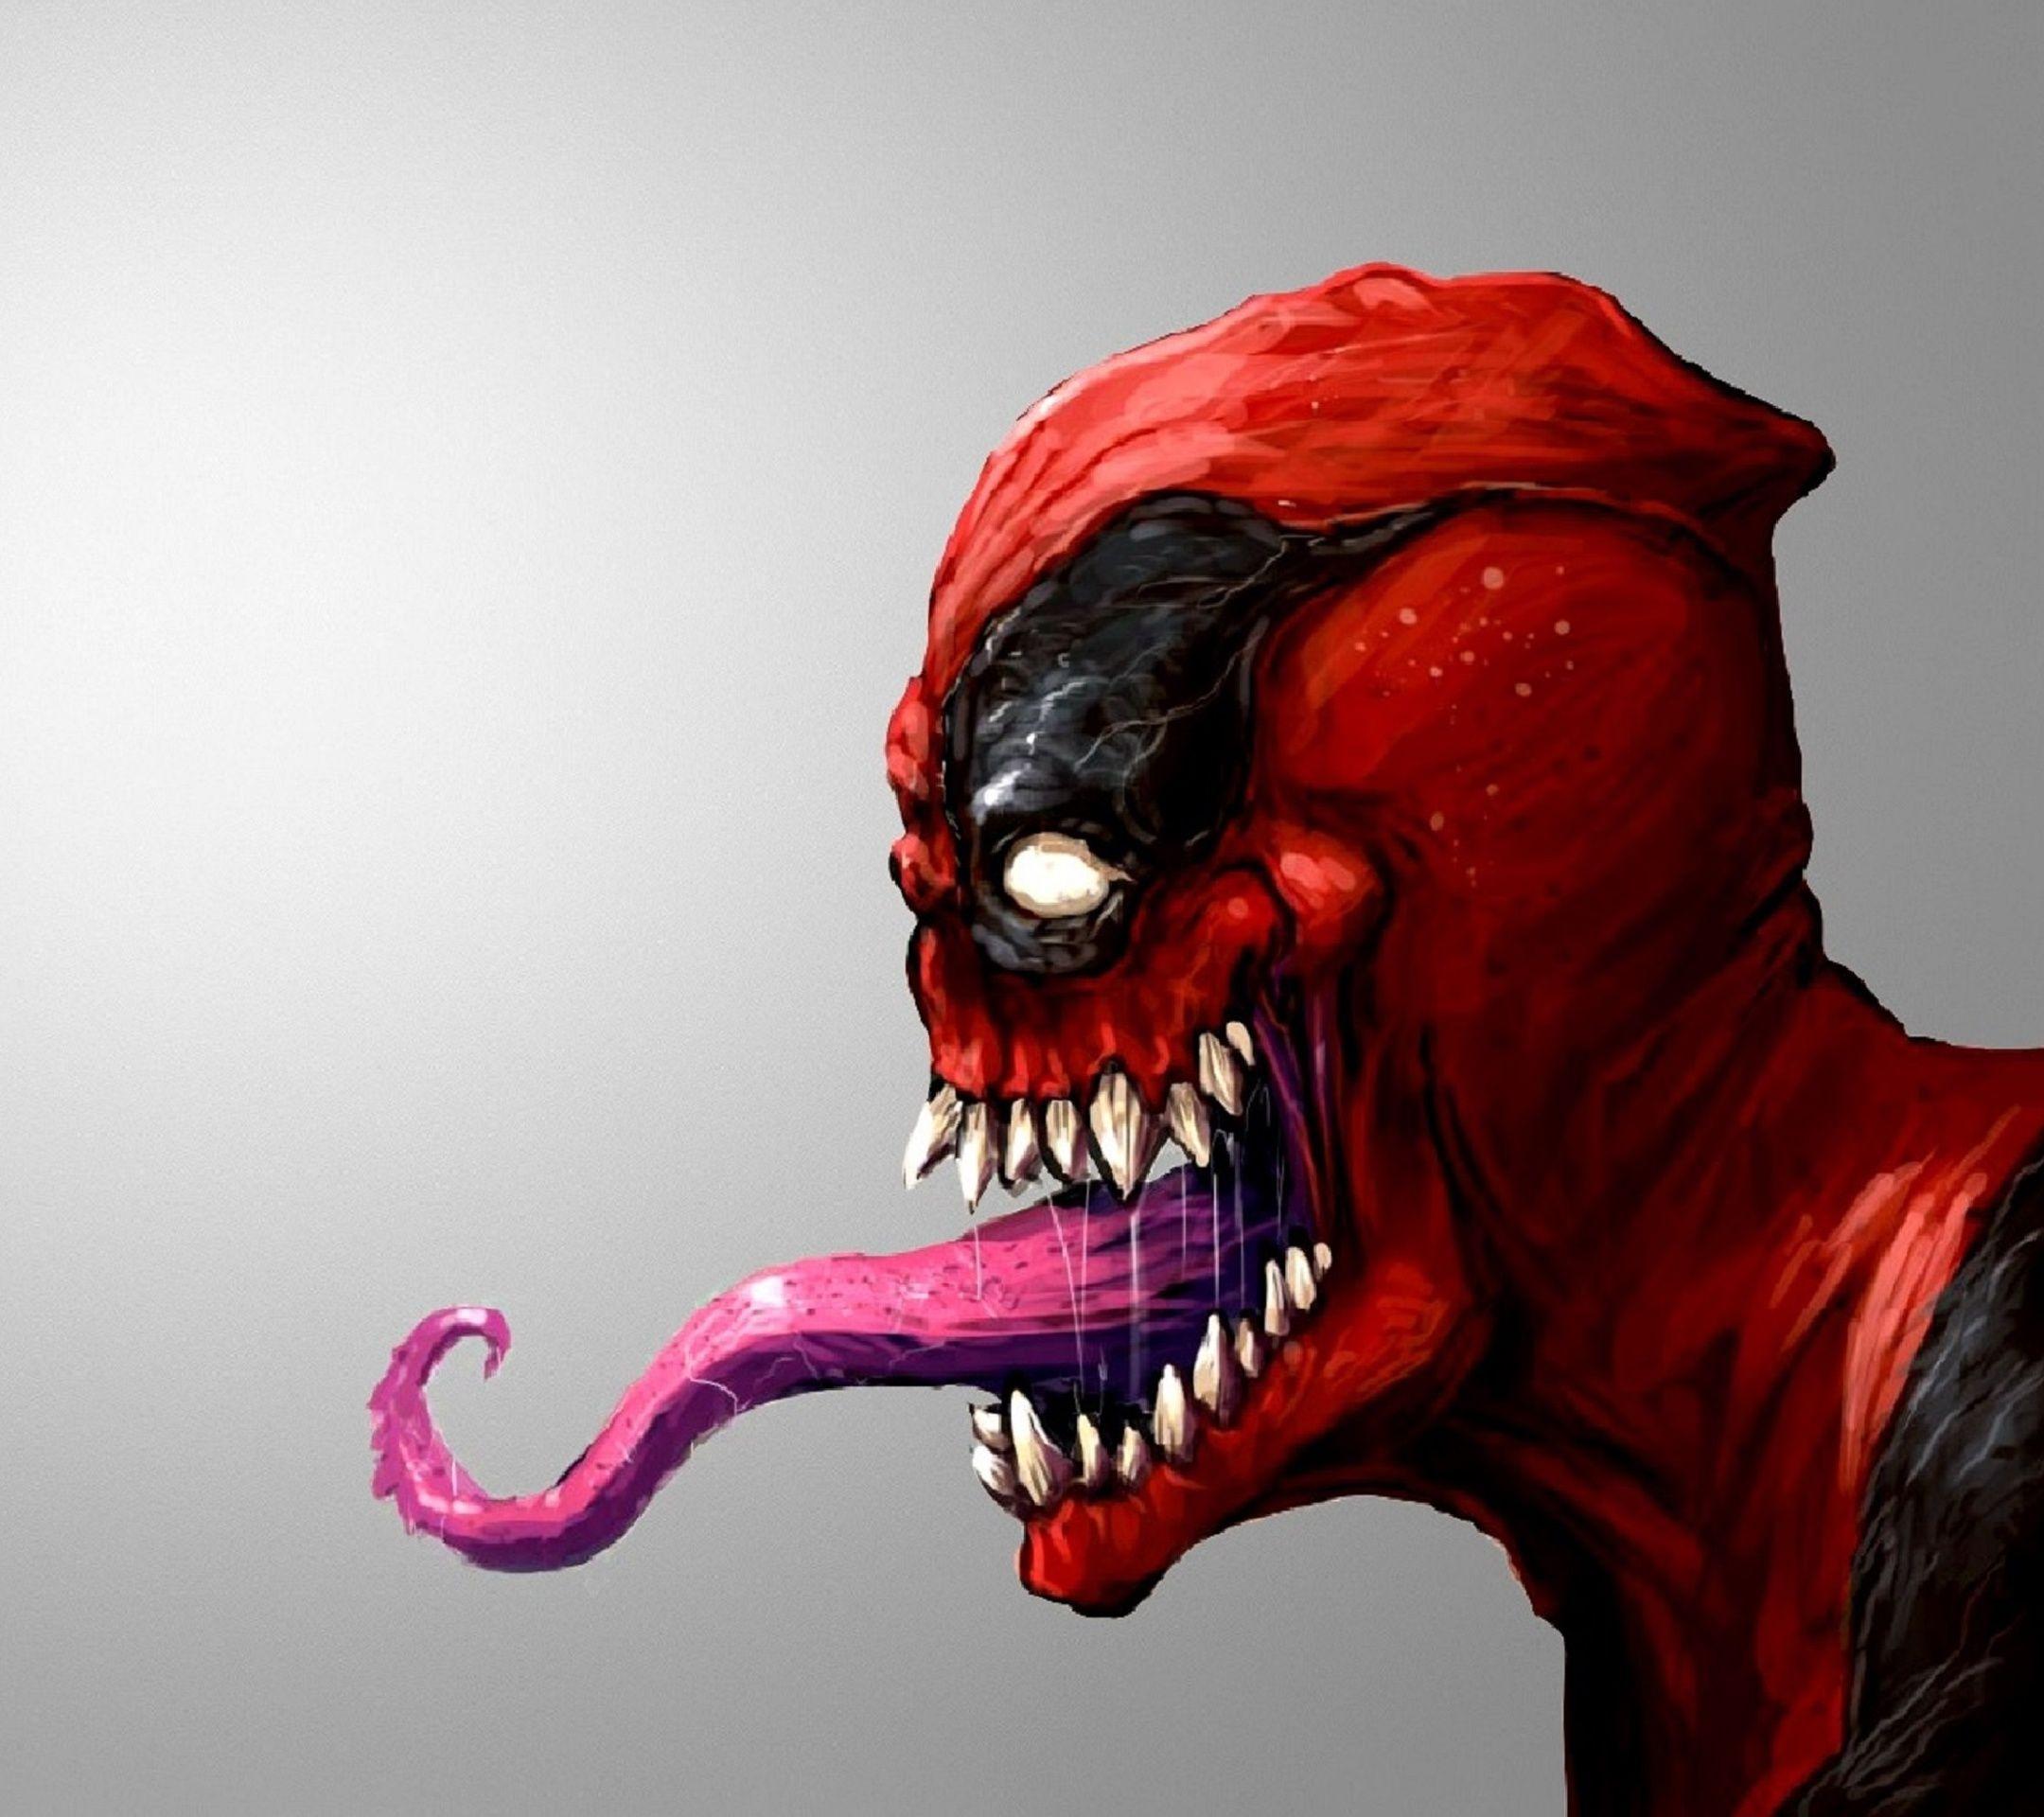 Venom Deadpool Wallpapers - Top Free Venom Deadpool ...